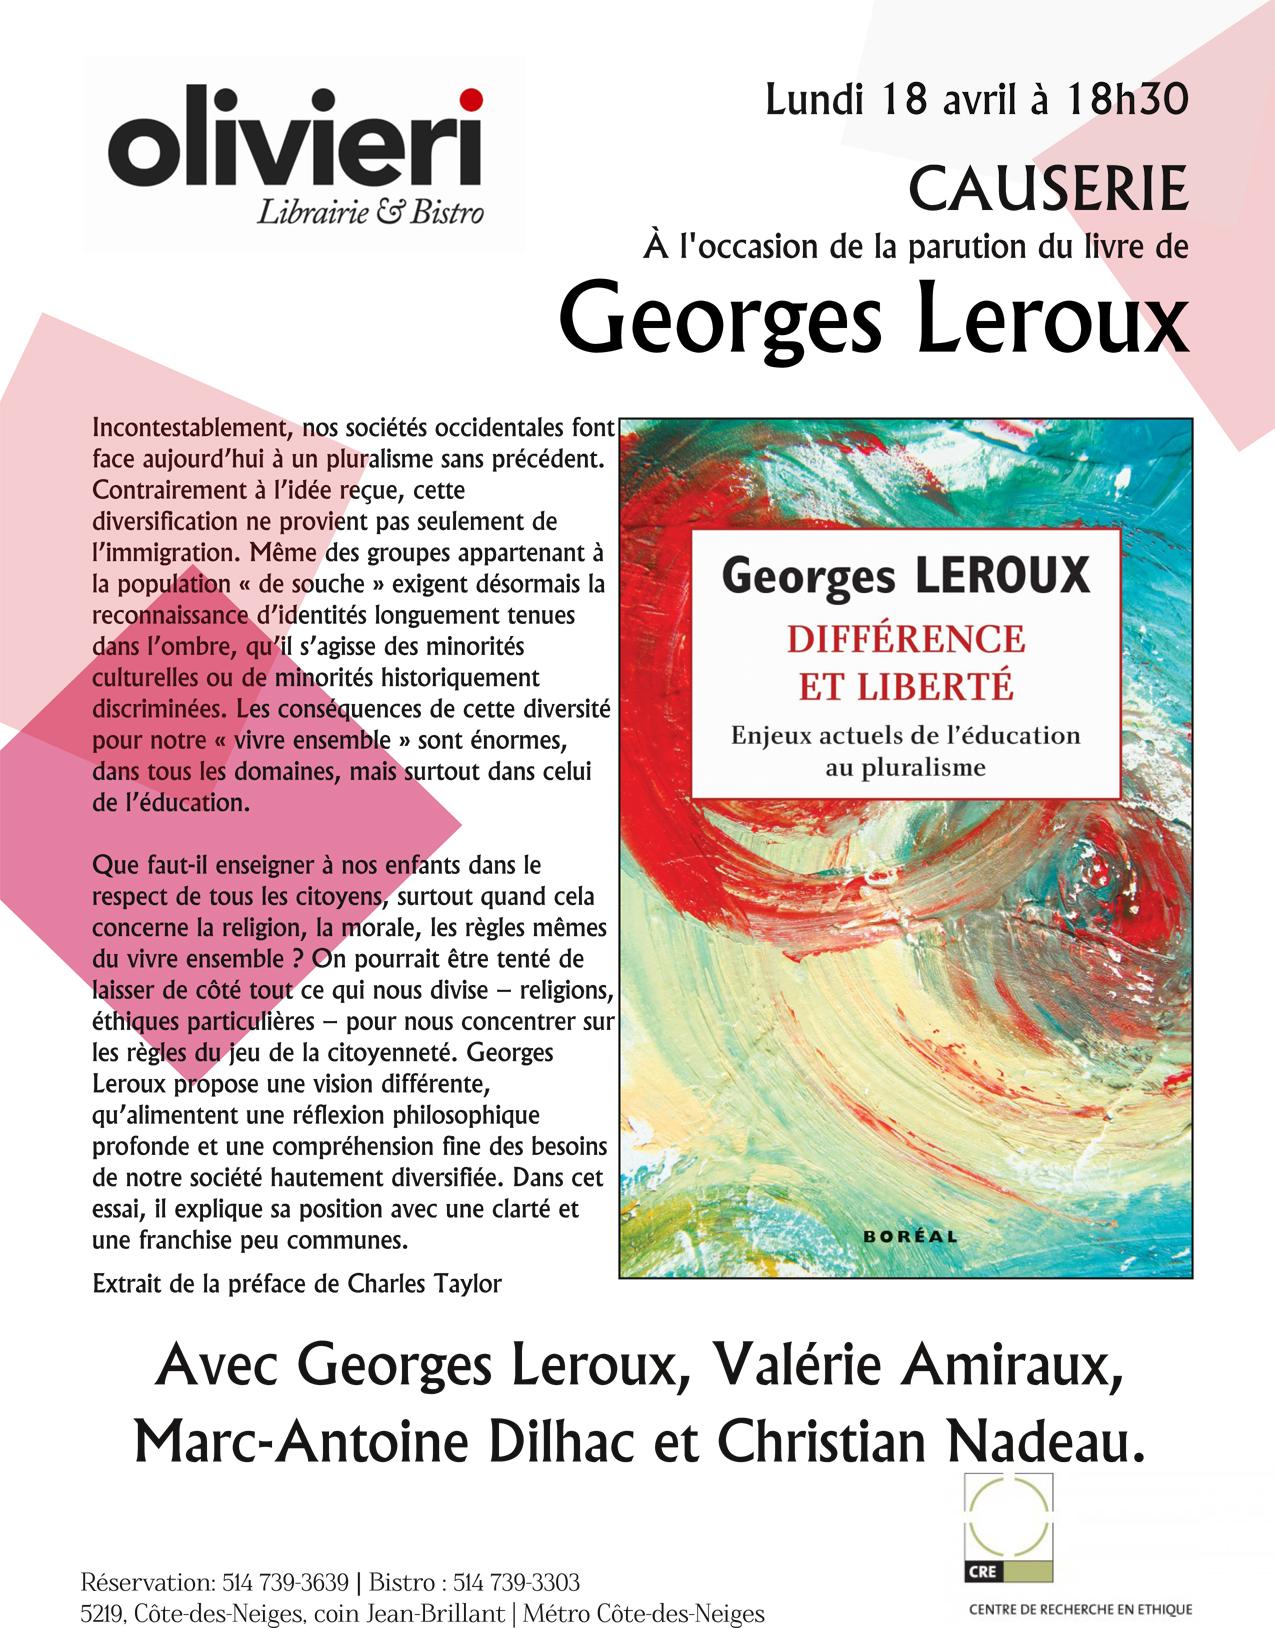 gleroux_olivieri